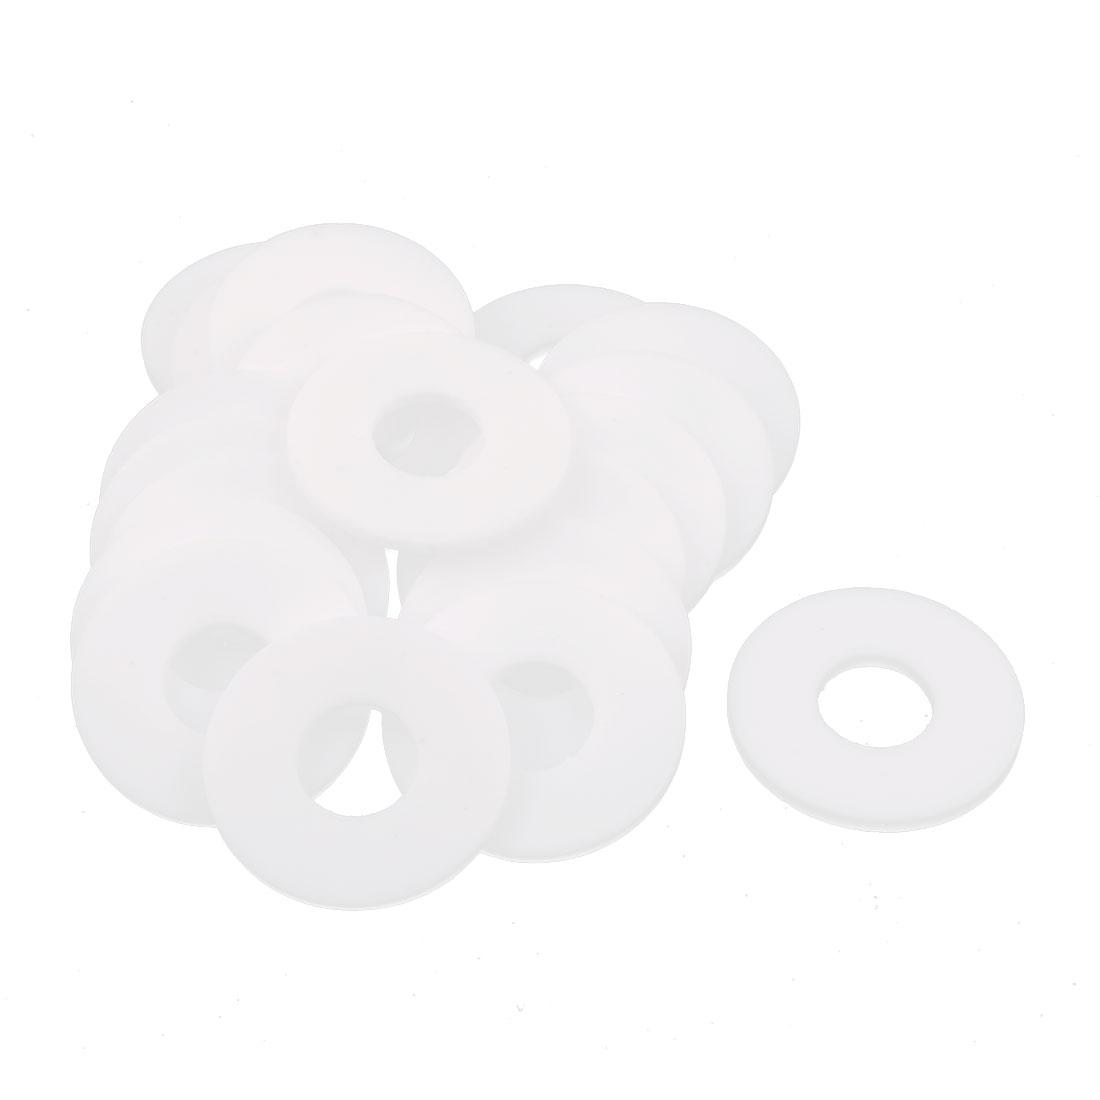 20 Pcs DN15 45 x 18 x 3mm PTFE Flange Gasket Sanitary Pipe Fitting Ferrule White